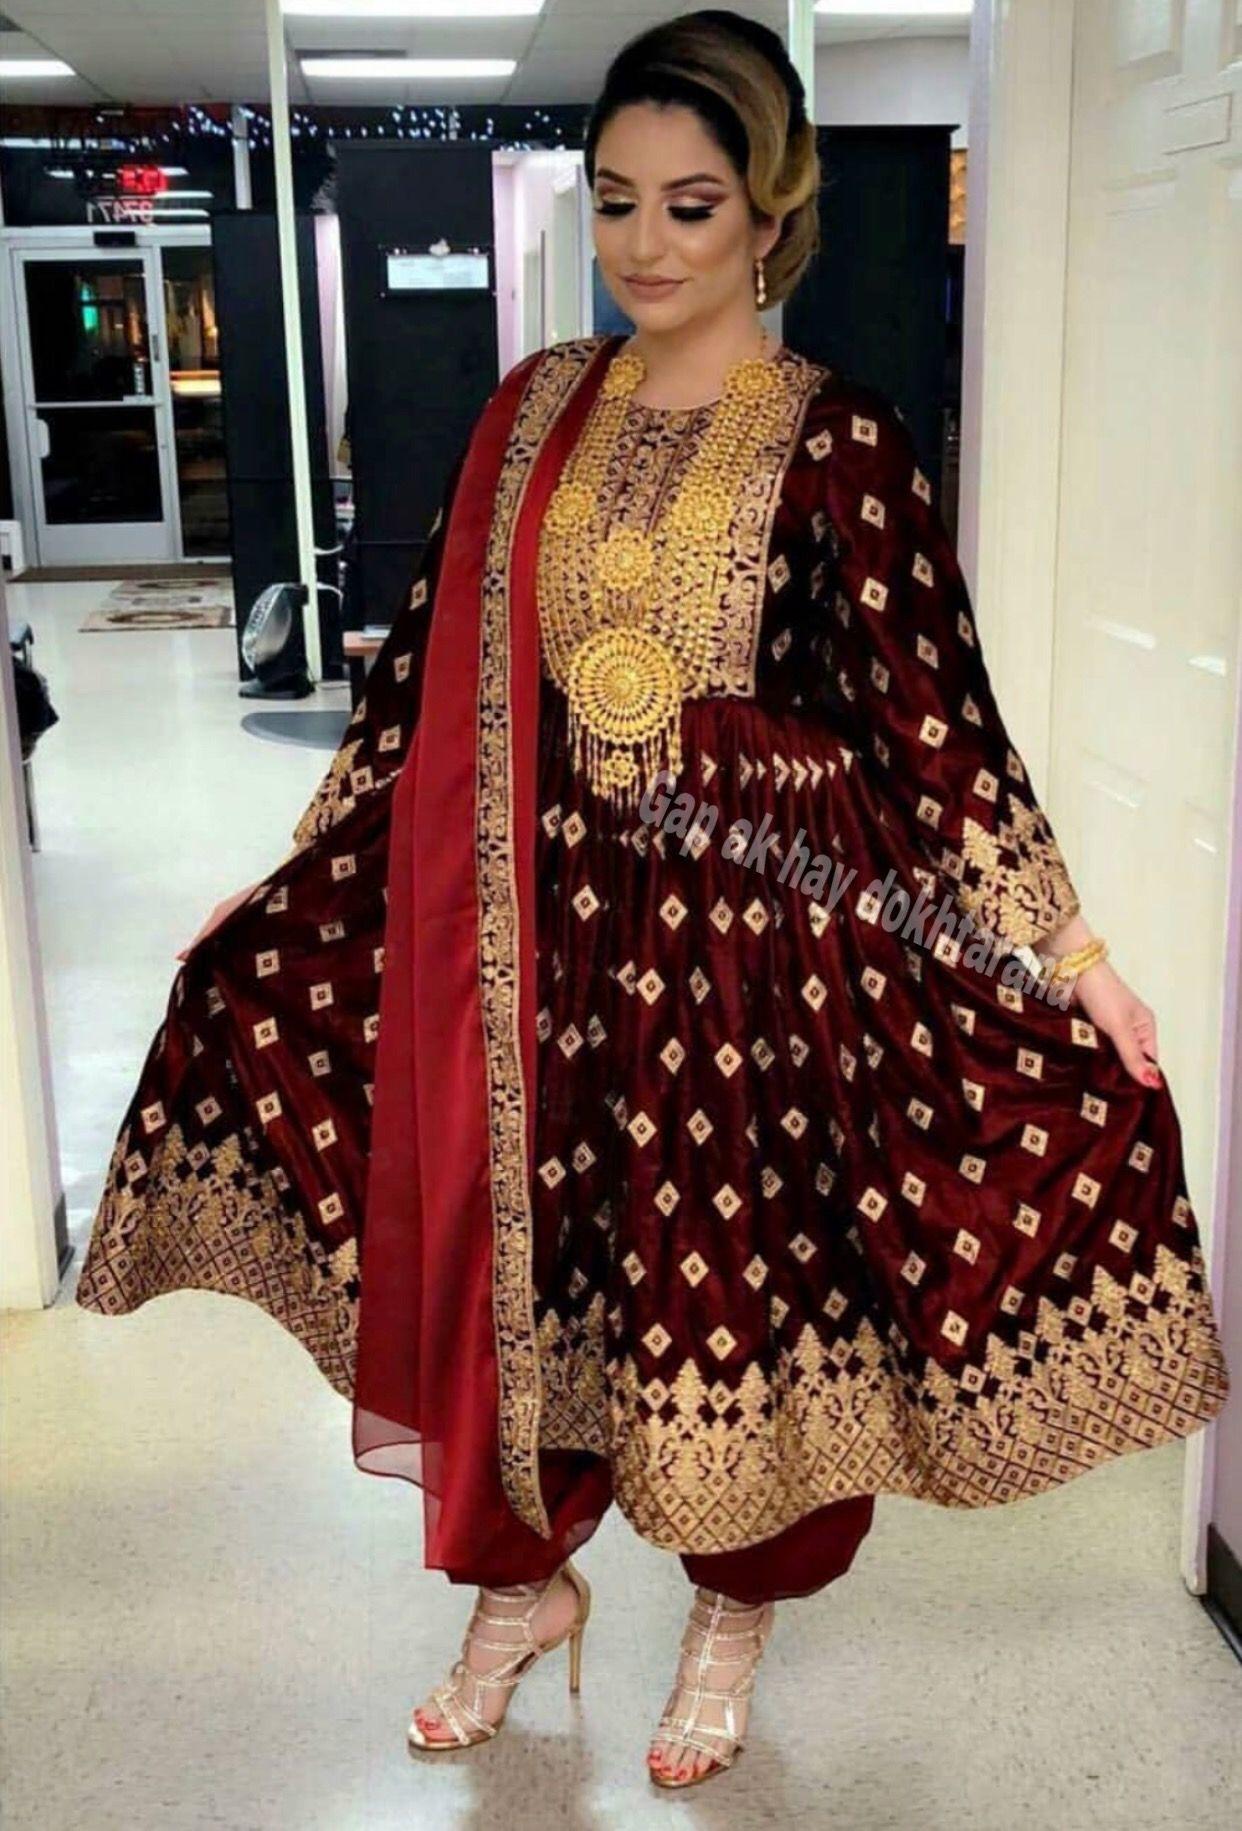 afghan #style #dress | afghanische kleider, kleider